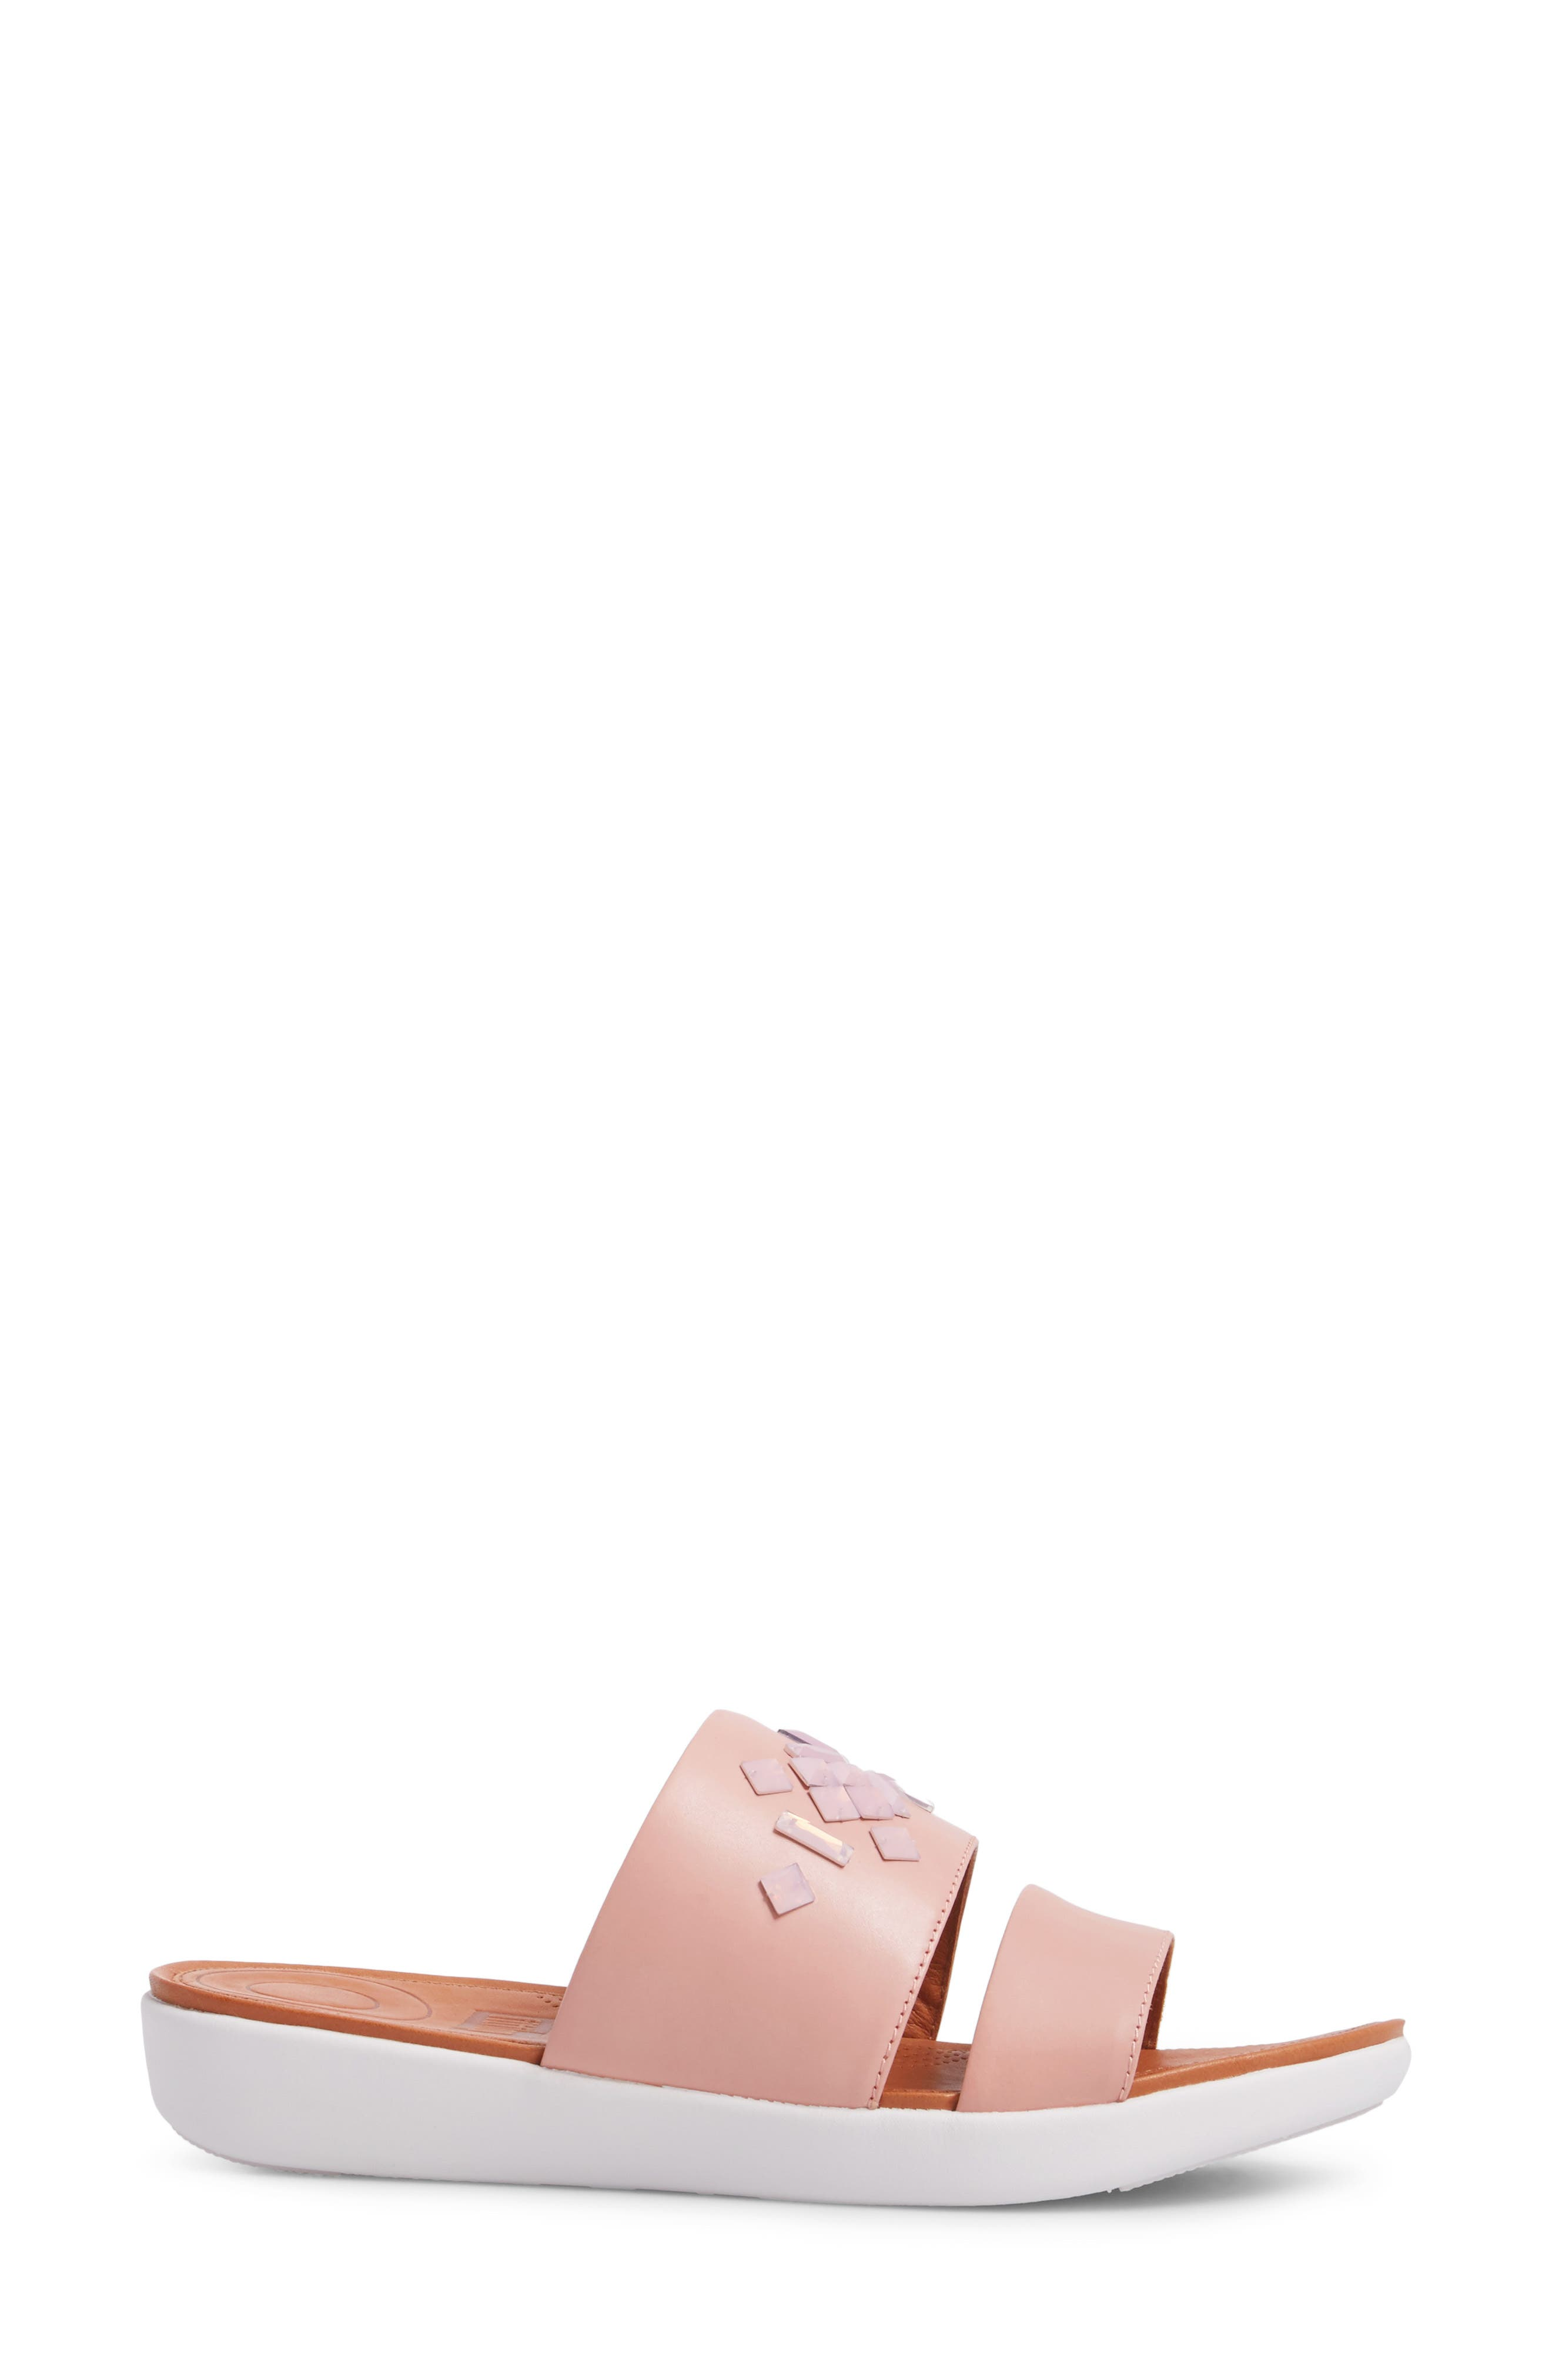 FITFLOP,                             Delta Slide Sandal,                             Alternate thumbnail 3, color,                             DUSTY PINK LEATHER